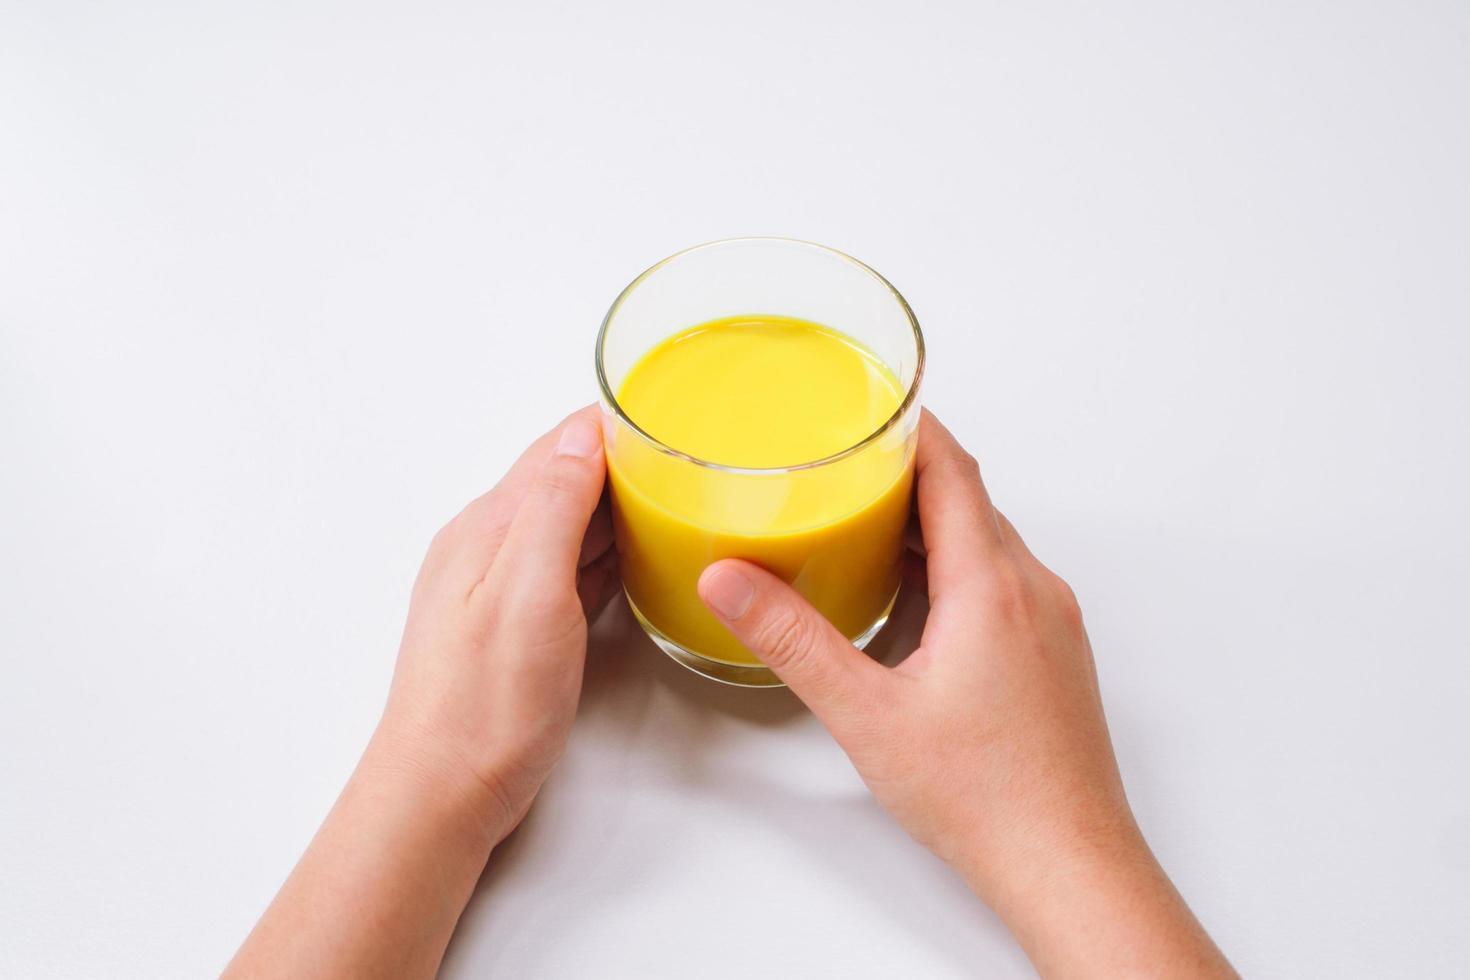 händer som håller ett glas gyllene mjölk gurkmeja latte foto